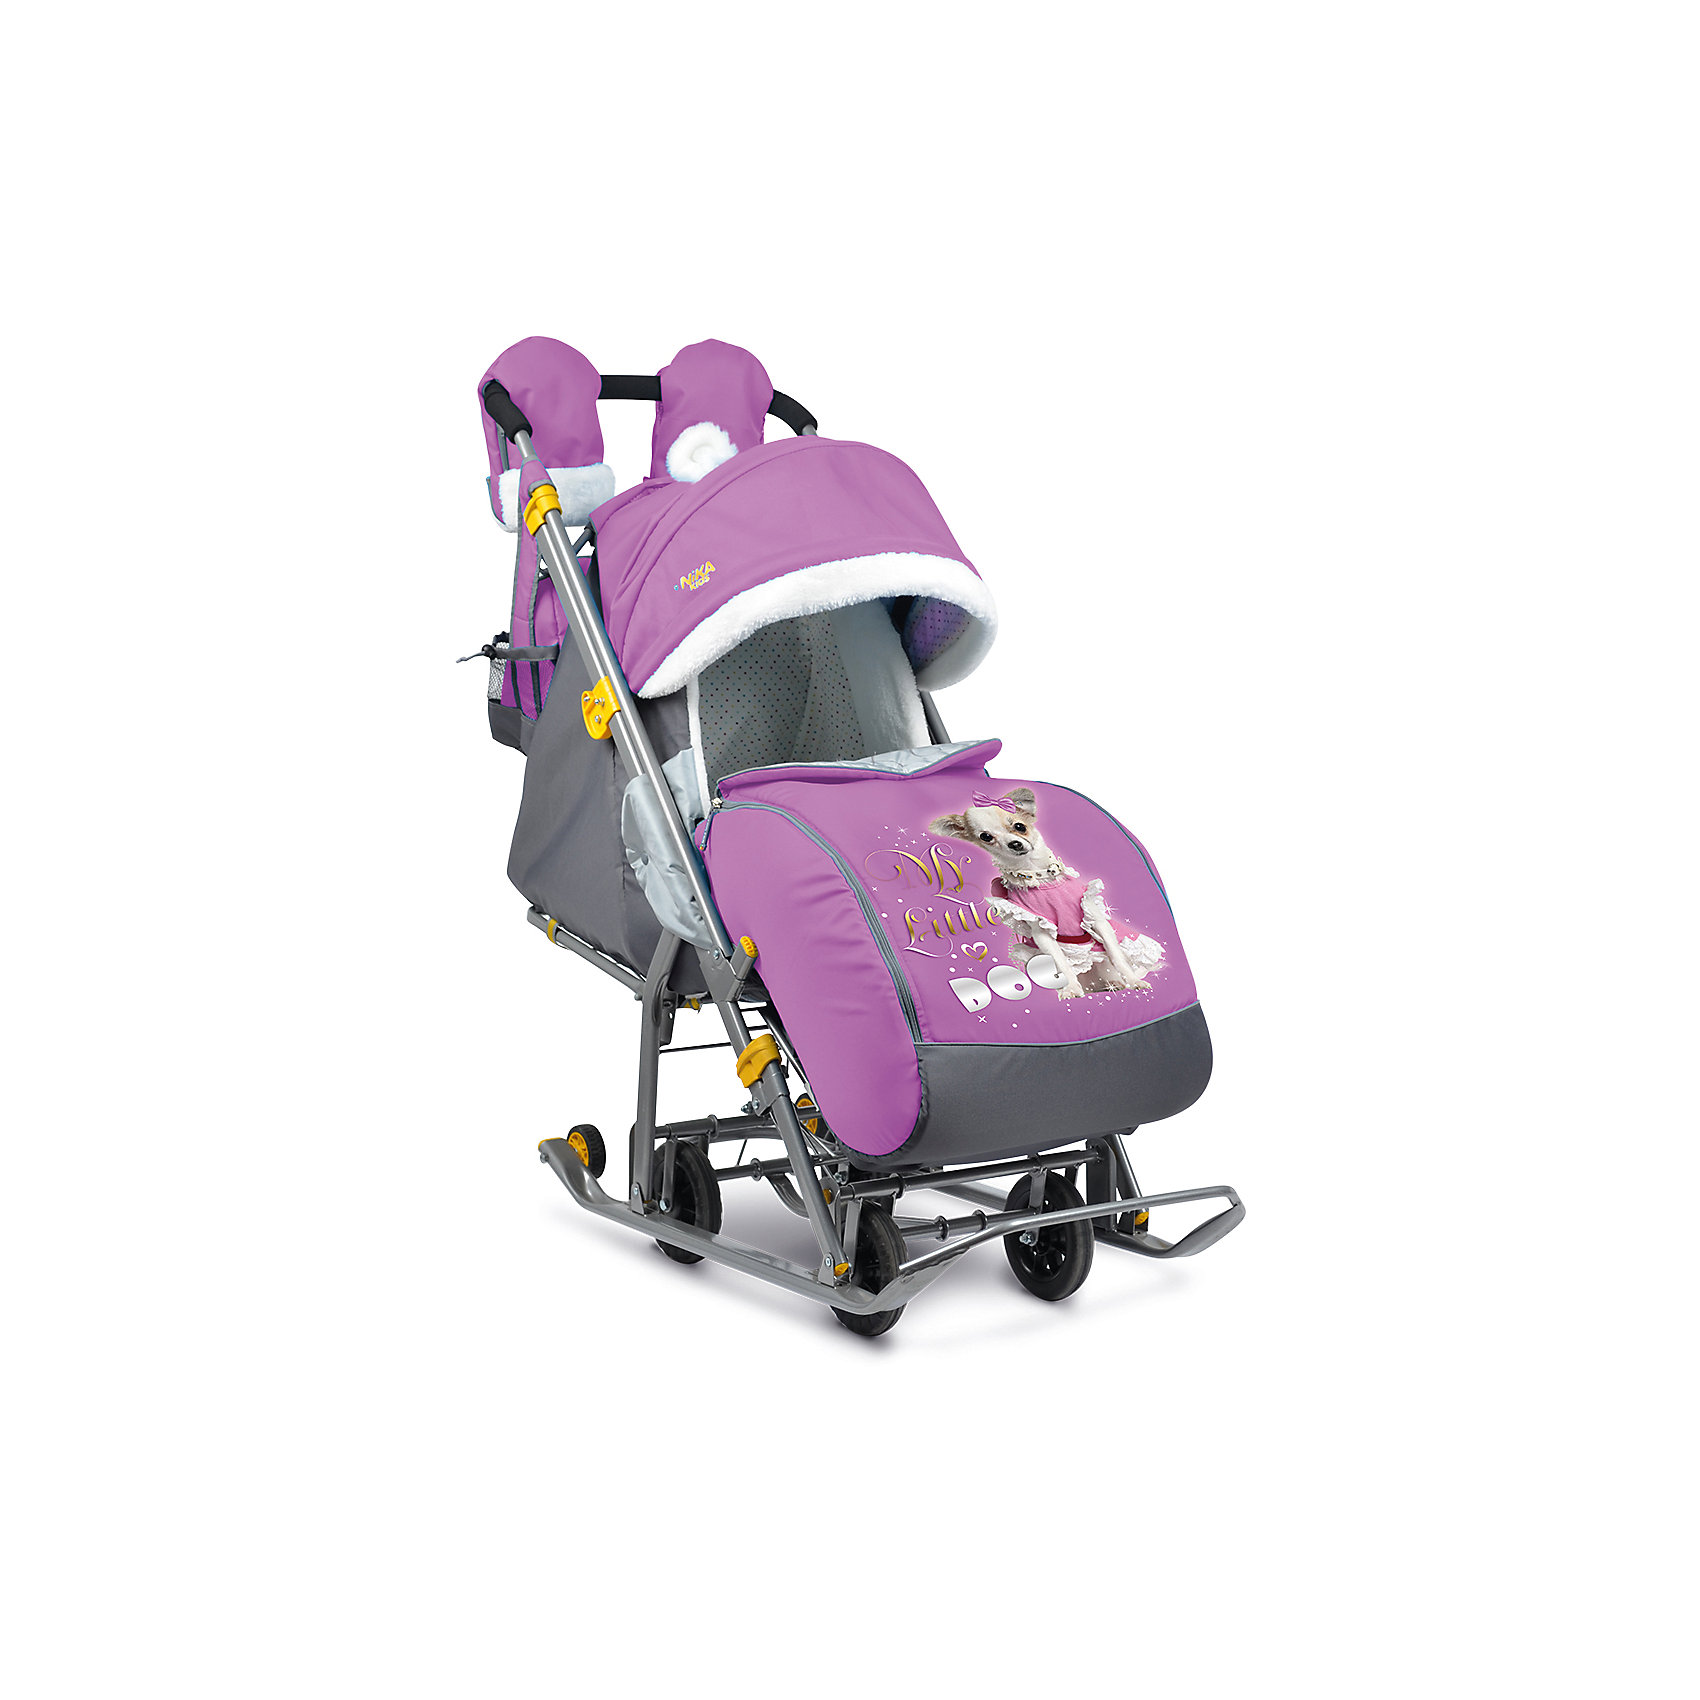 Ника Санки-коляска Ника детям 7-2 Dog, орхидея ника санки коляска детские лилия